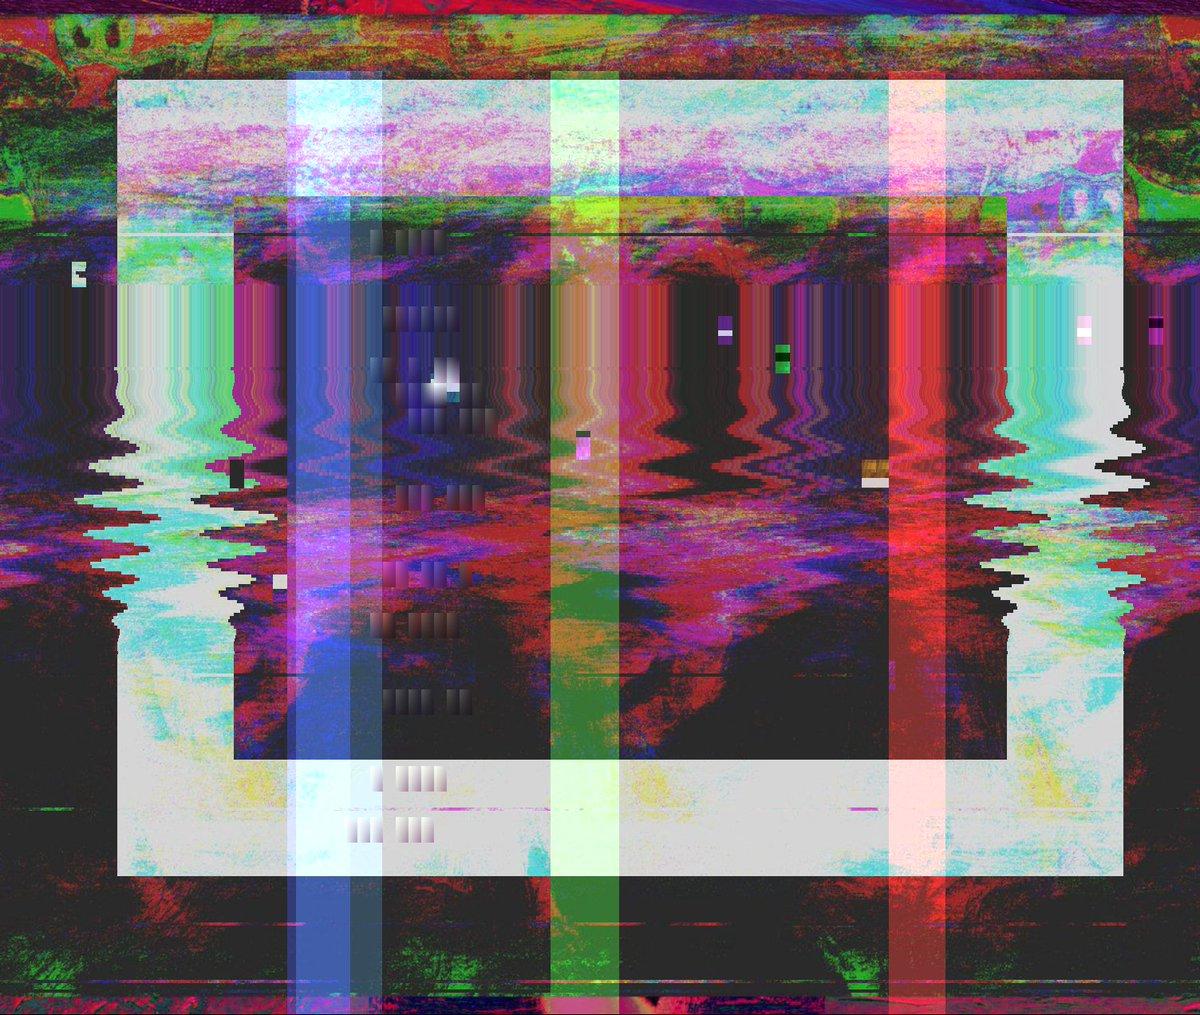 👾🆙 glitchart glitch audacity lsd curve freak arte art databending Origin img by @f_for_fuck4ever